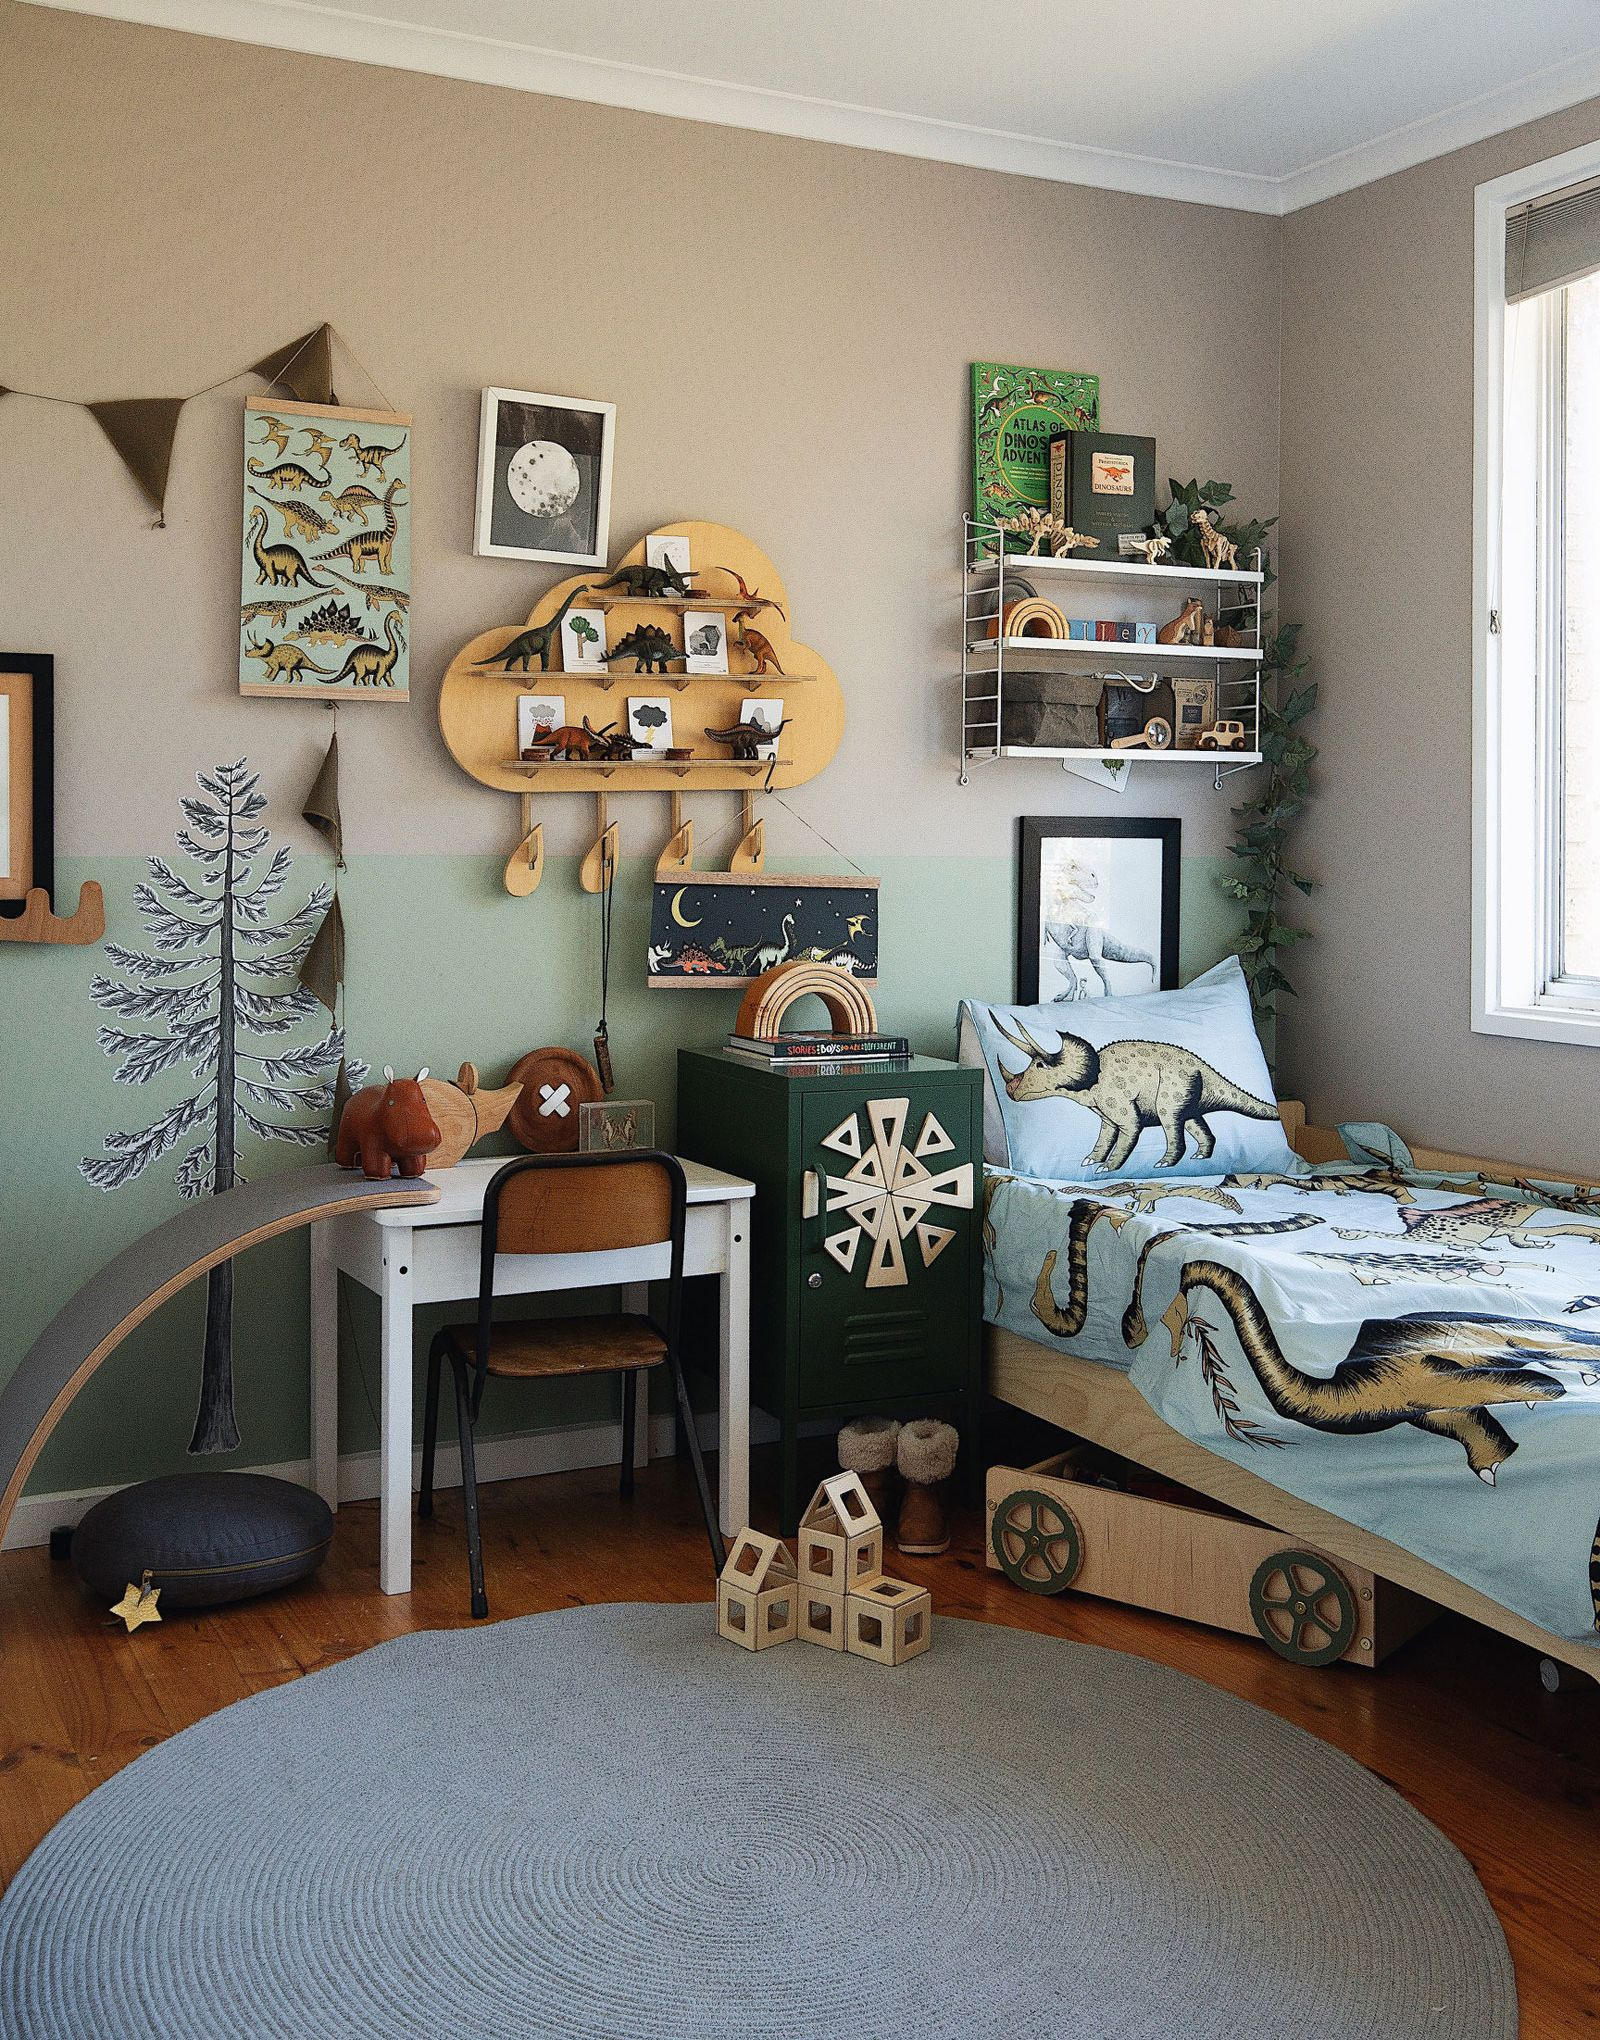 Riley S Earthy And Warm Dinosaur Room Roomtour Dinosaur Room Decor Dinosaur Room Kids Bedroom Designs